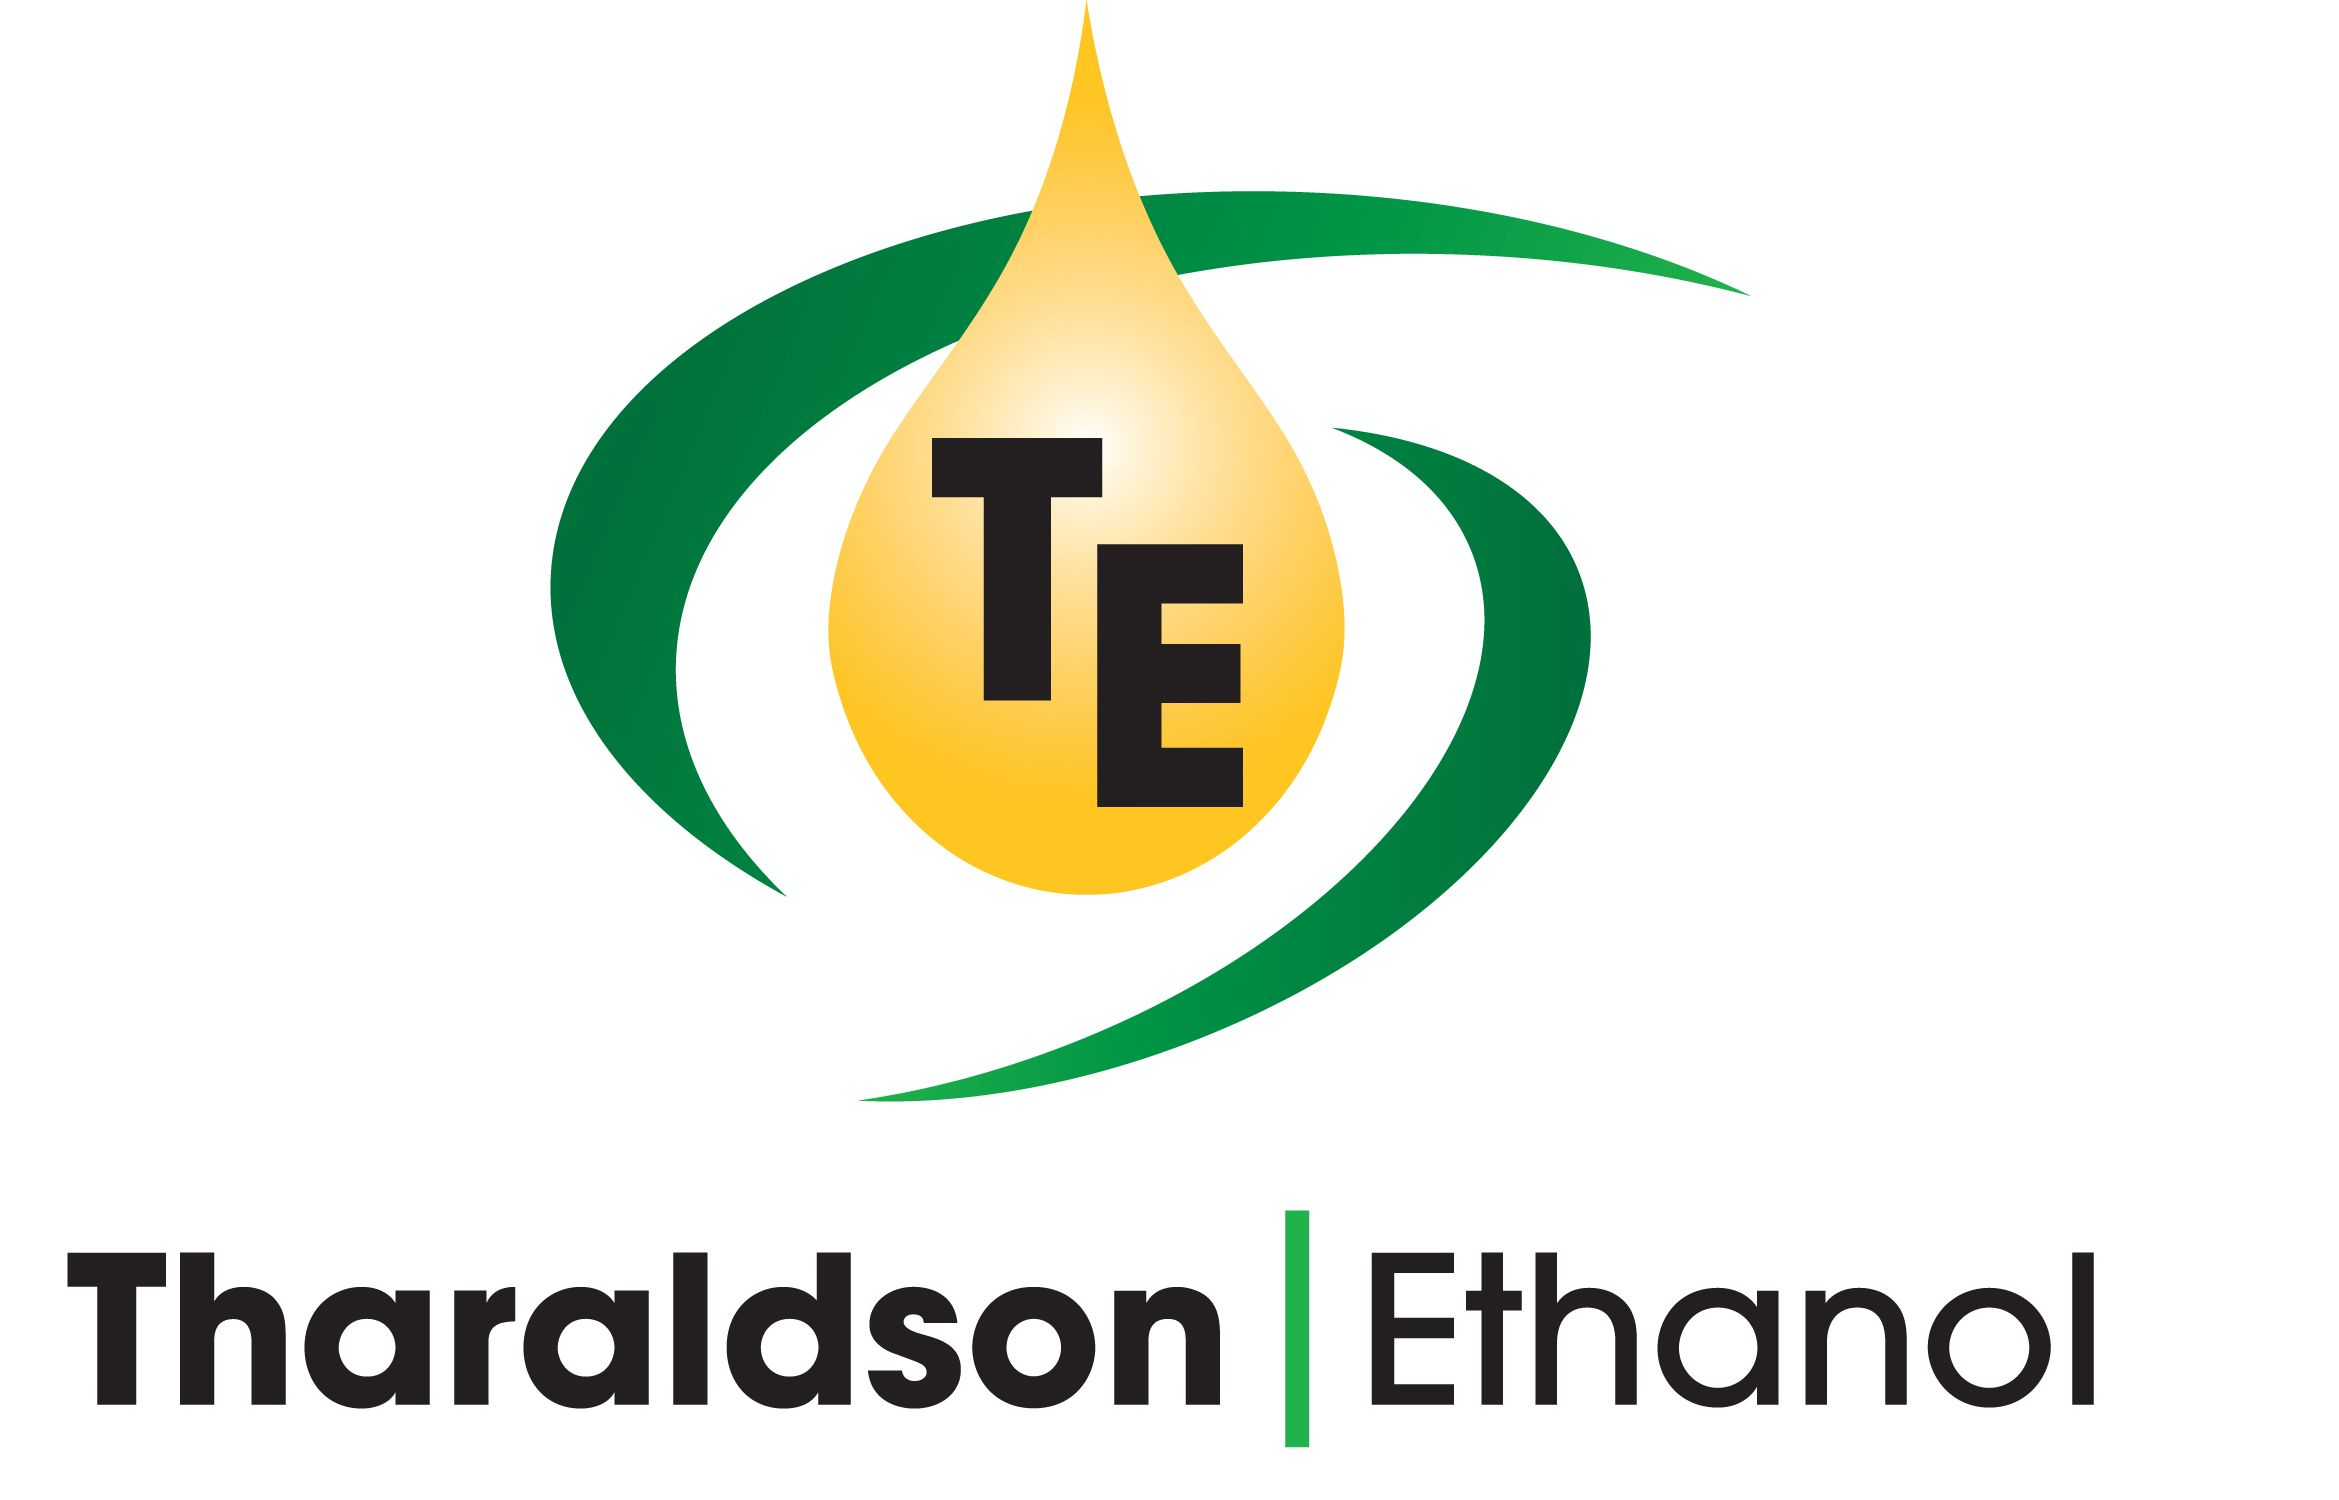 Silver Sponsor - Tharaldson Ethanol